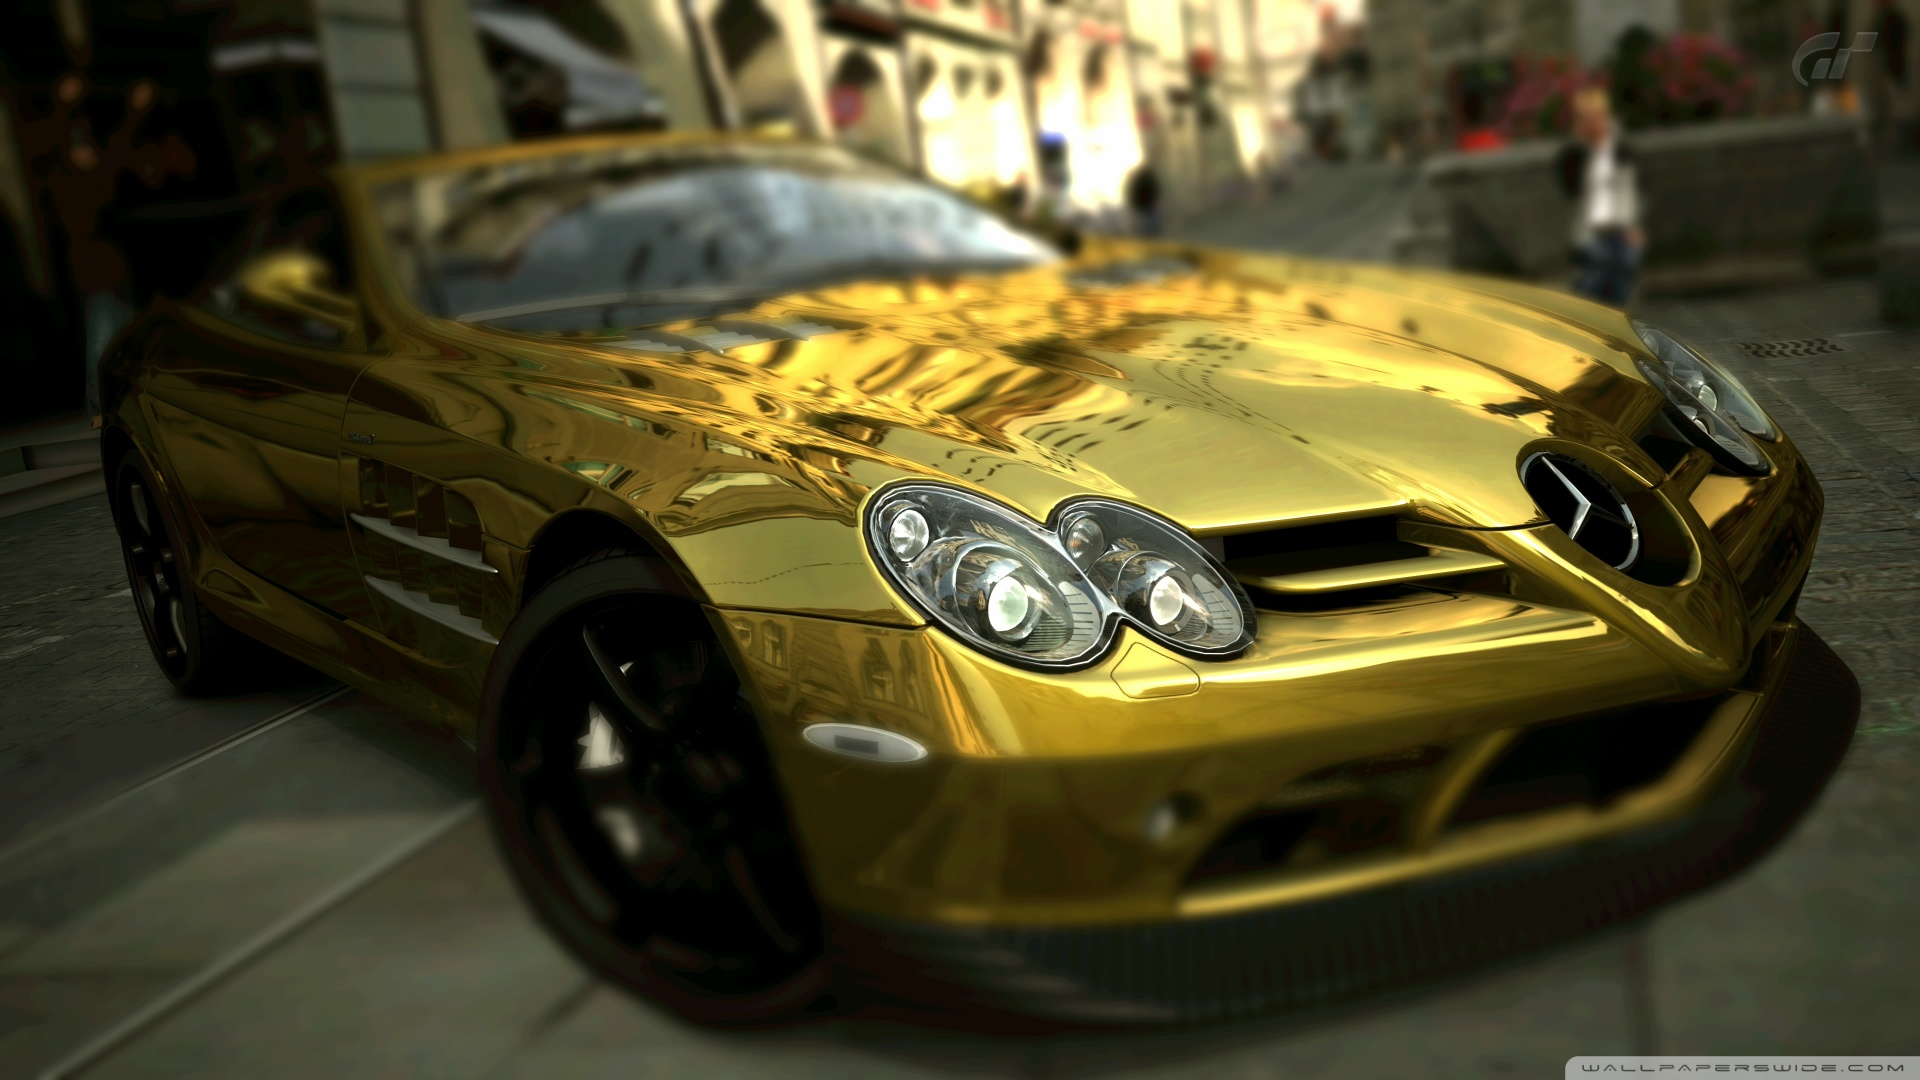 Mercedes benz slr mclaren gold 4k hd desktop wallpaper for - 4k car wallpaper for mobile ...